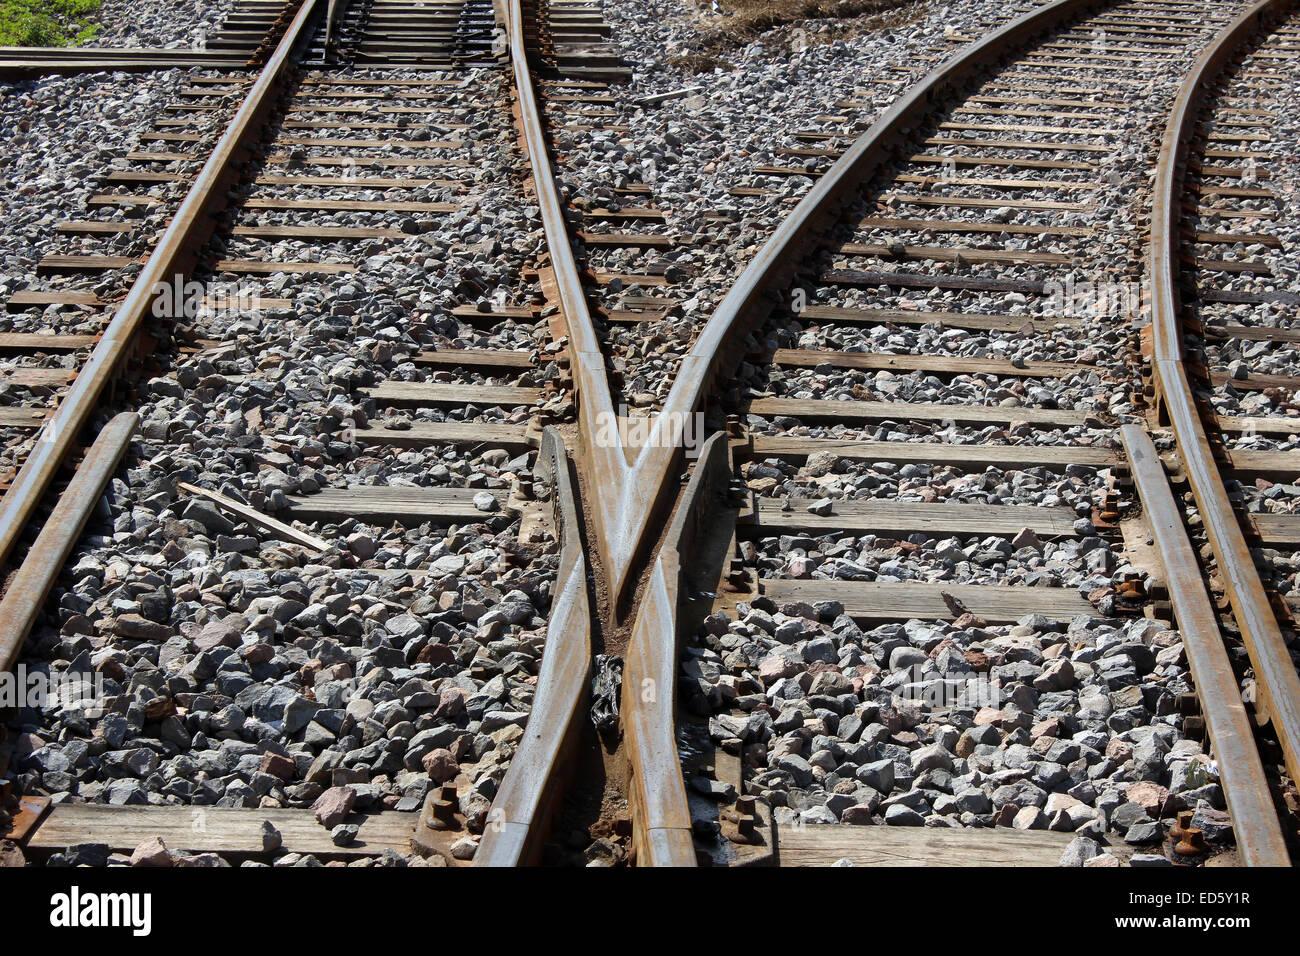 Railway tracks in a rail yard in Ibarra, Ecuador - Stock Image